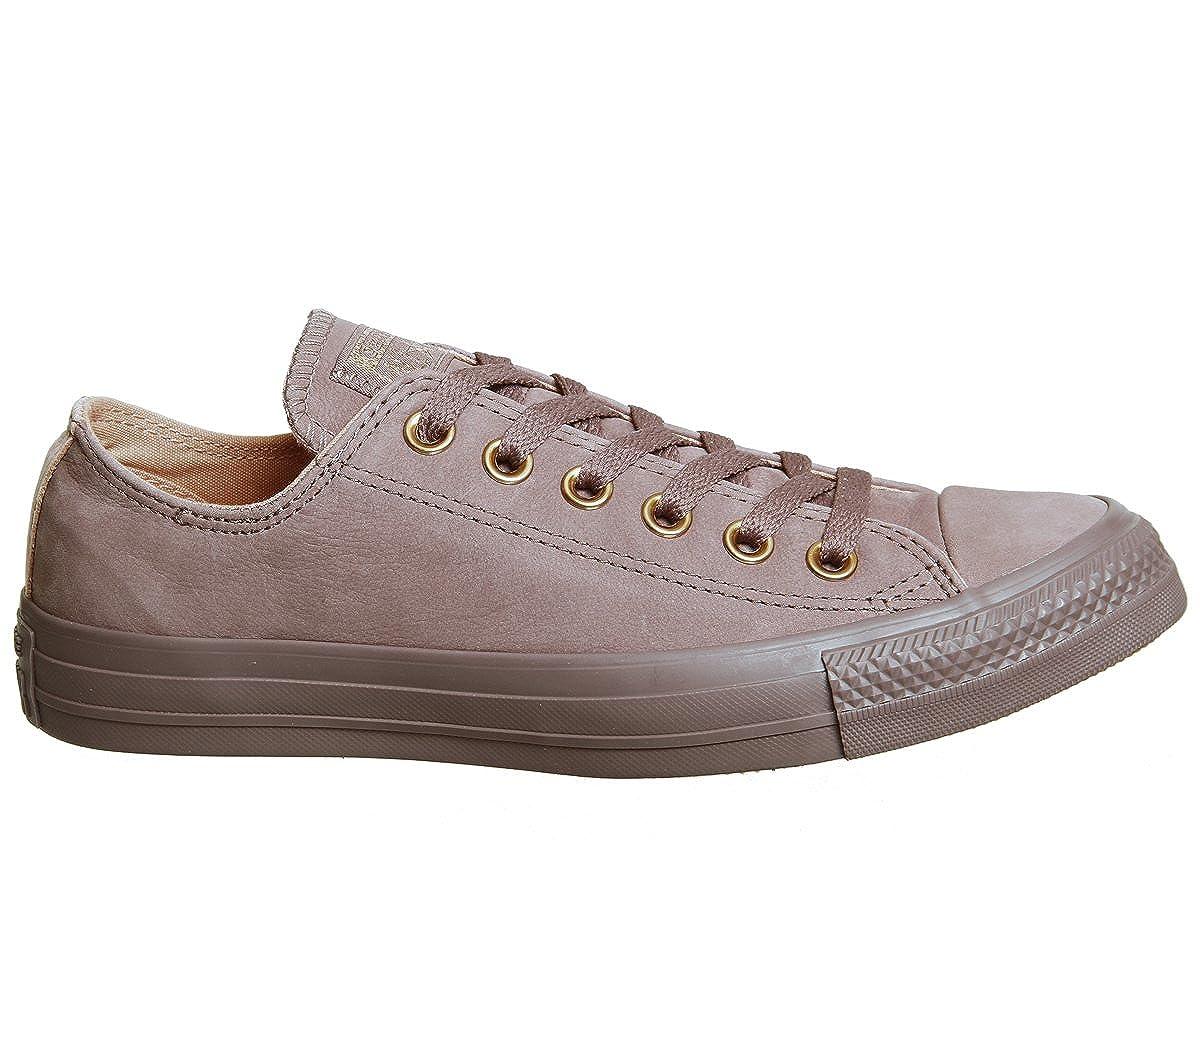 Converse Star Player de Ox, Chaussures de Player Fitness Mixte Adulte 5 UK|Saddle Pale Coral Exclusive 1409e6